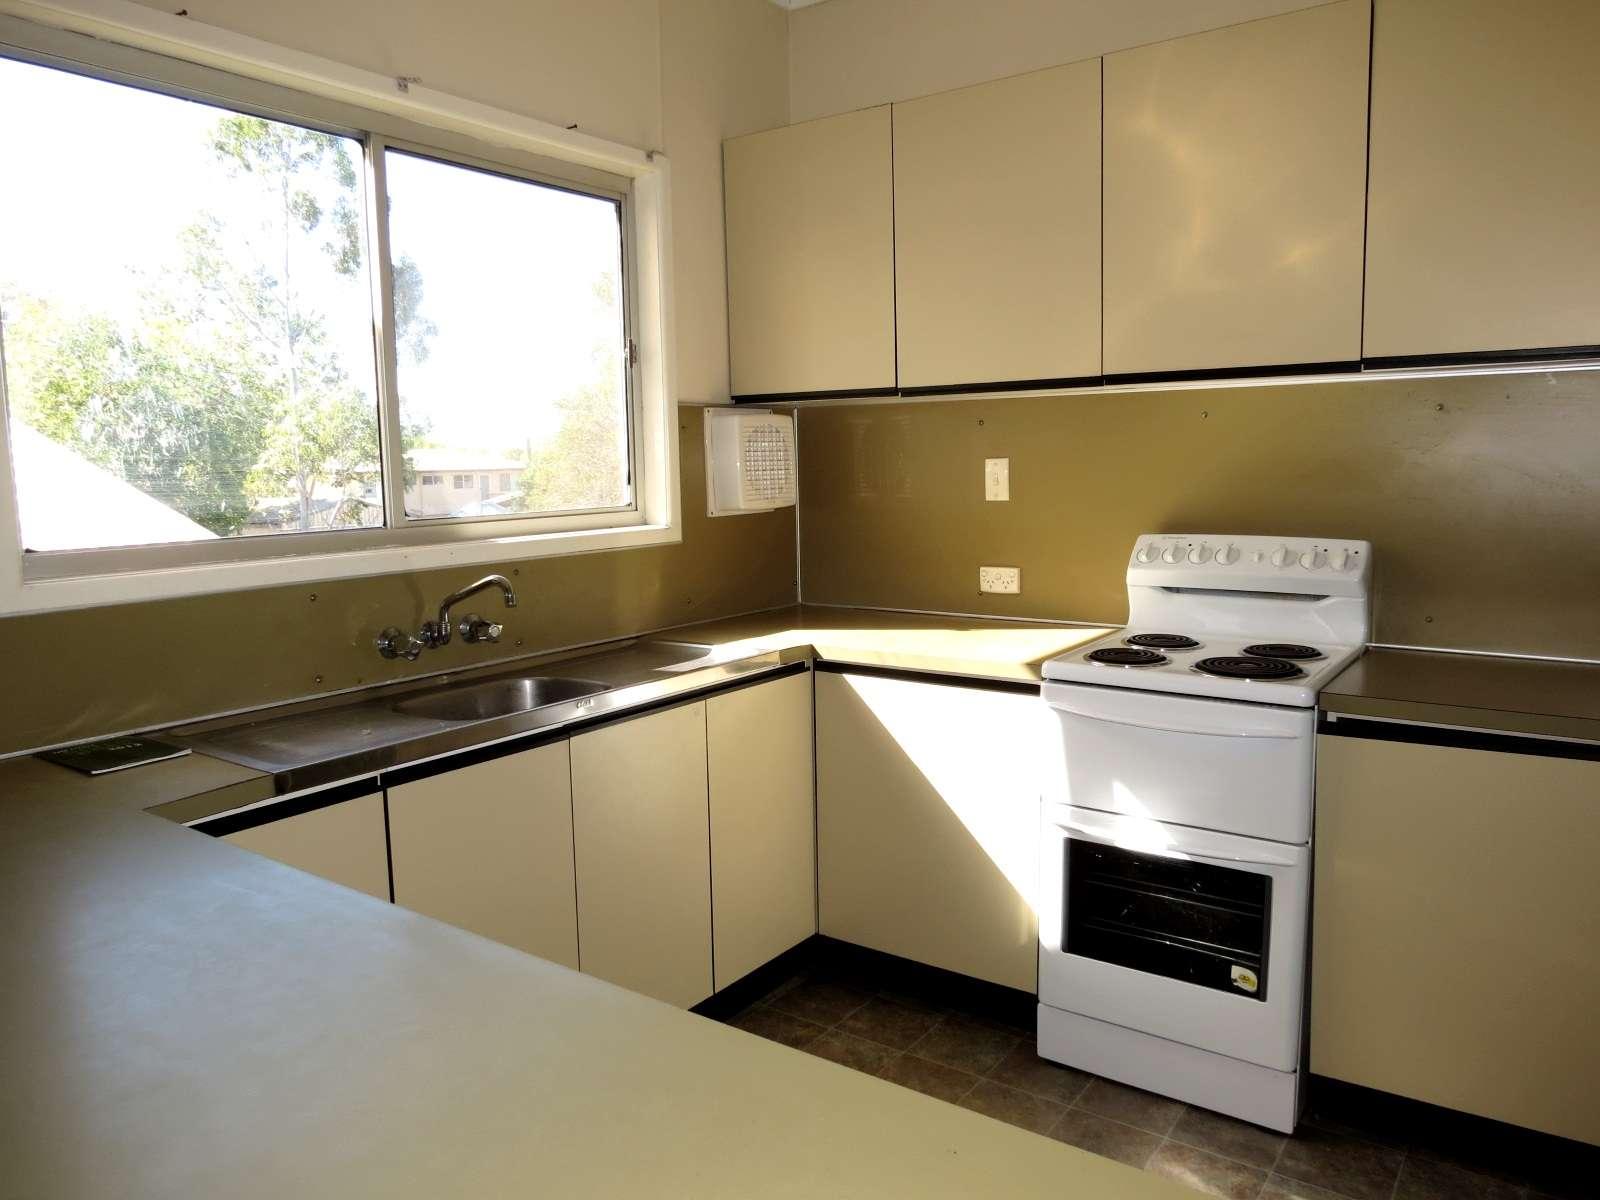 19 Mclean Street, CAPELLA, QLD 4723